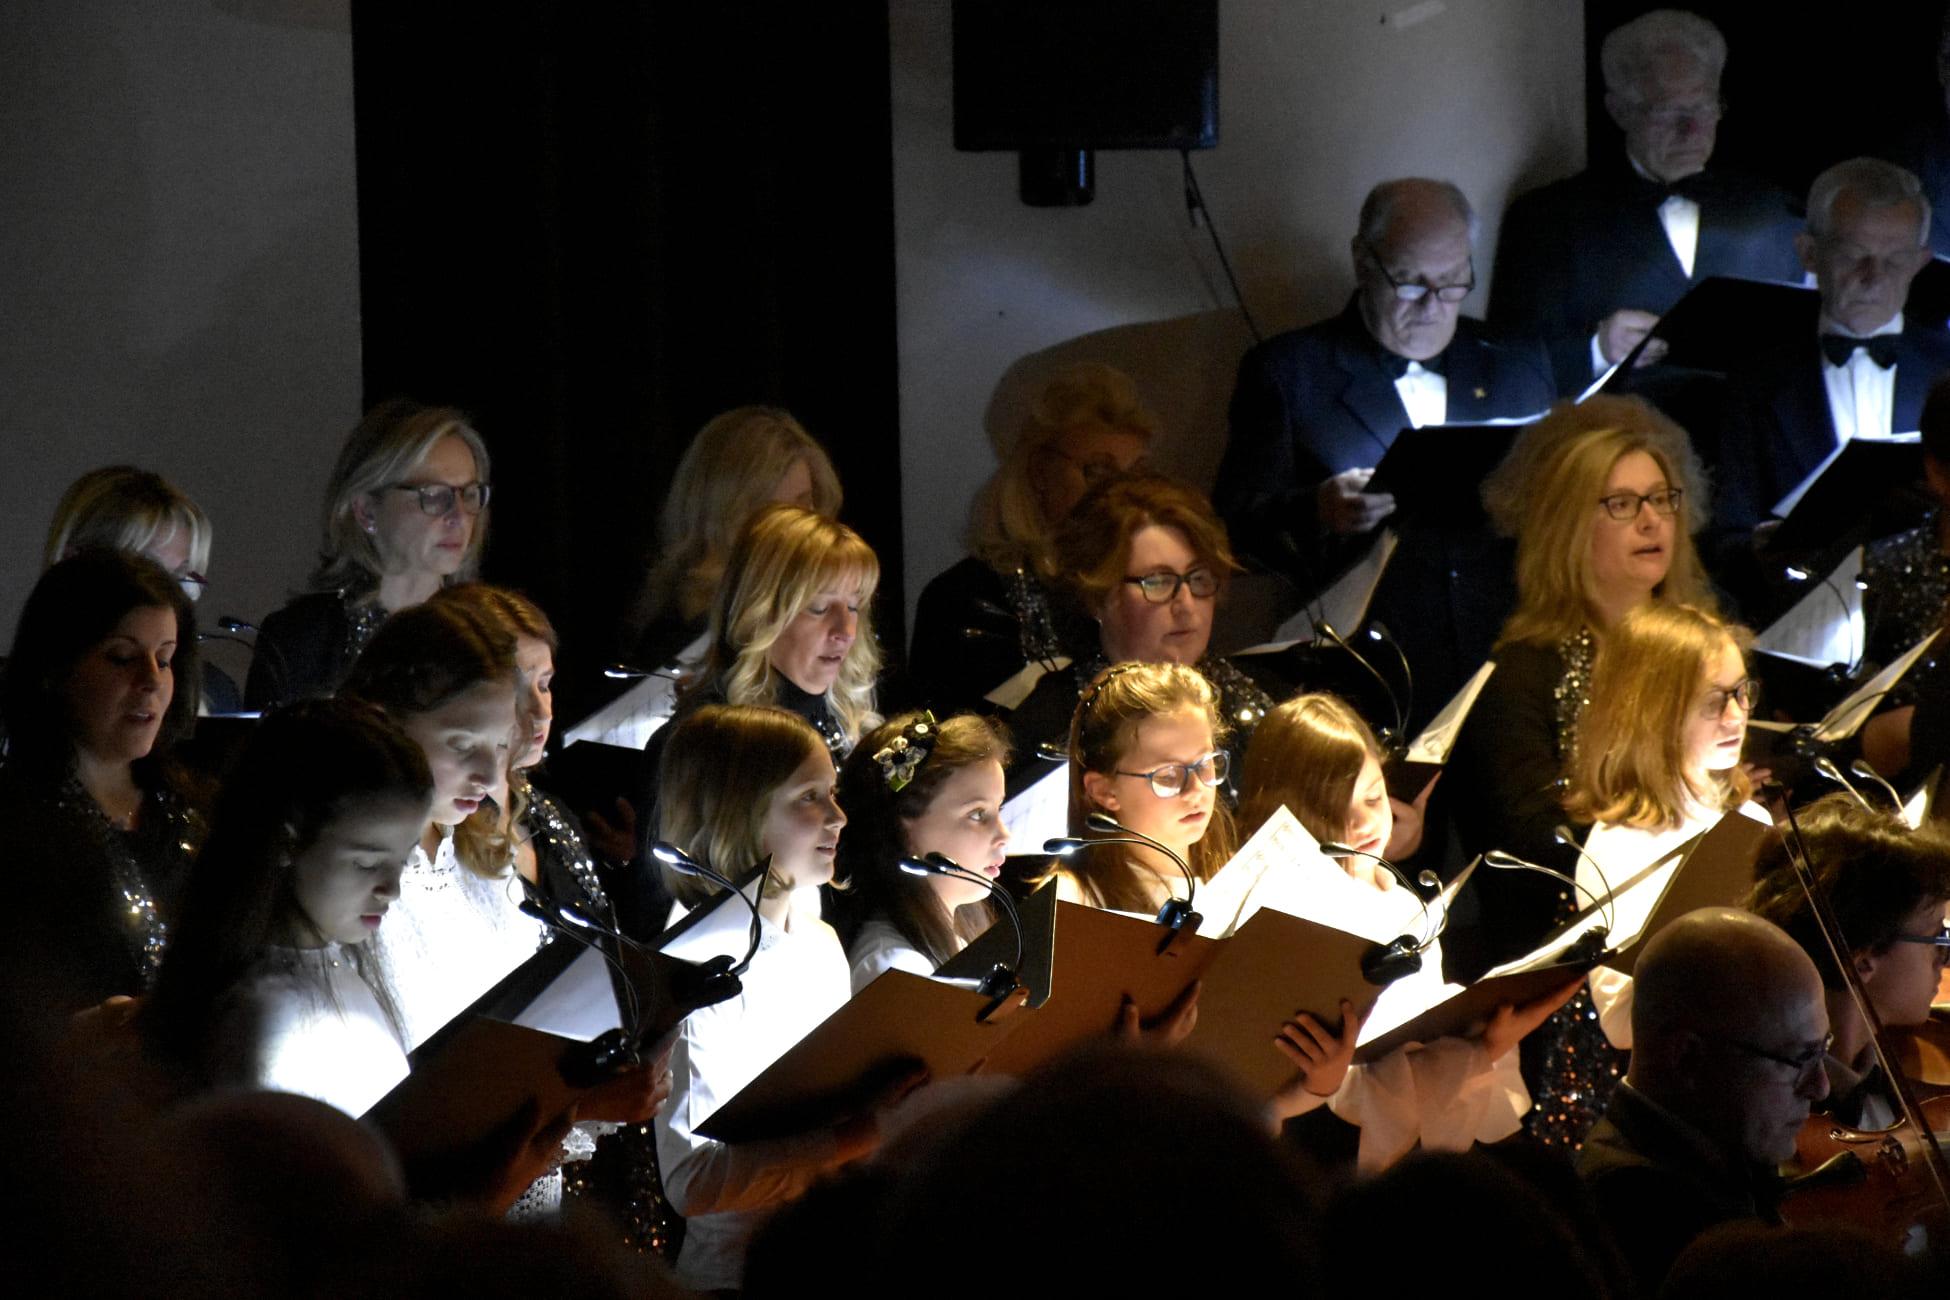 coro amadeus orchestra goldberg Rescaldina 18-marzo-2018